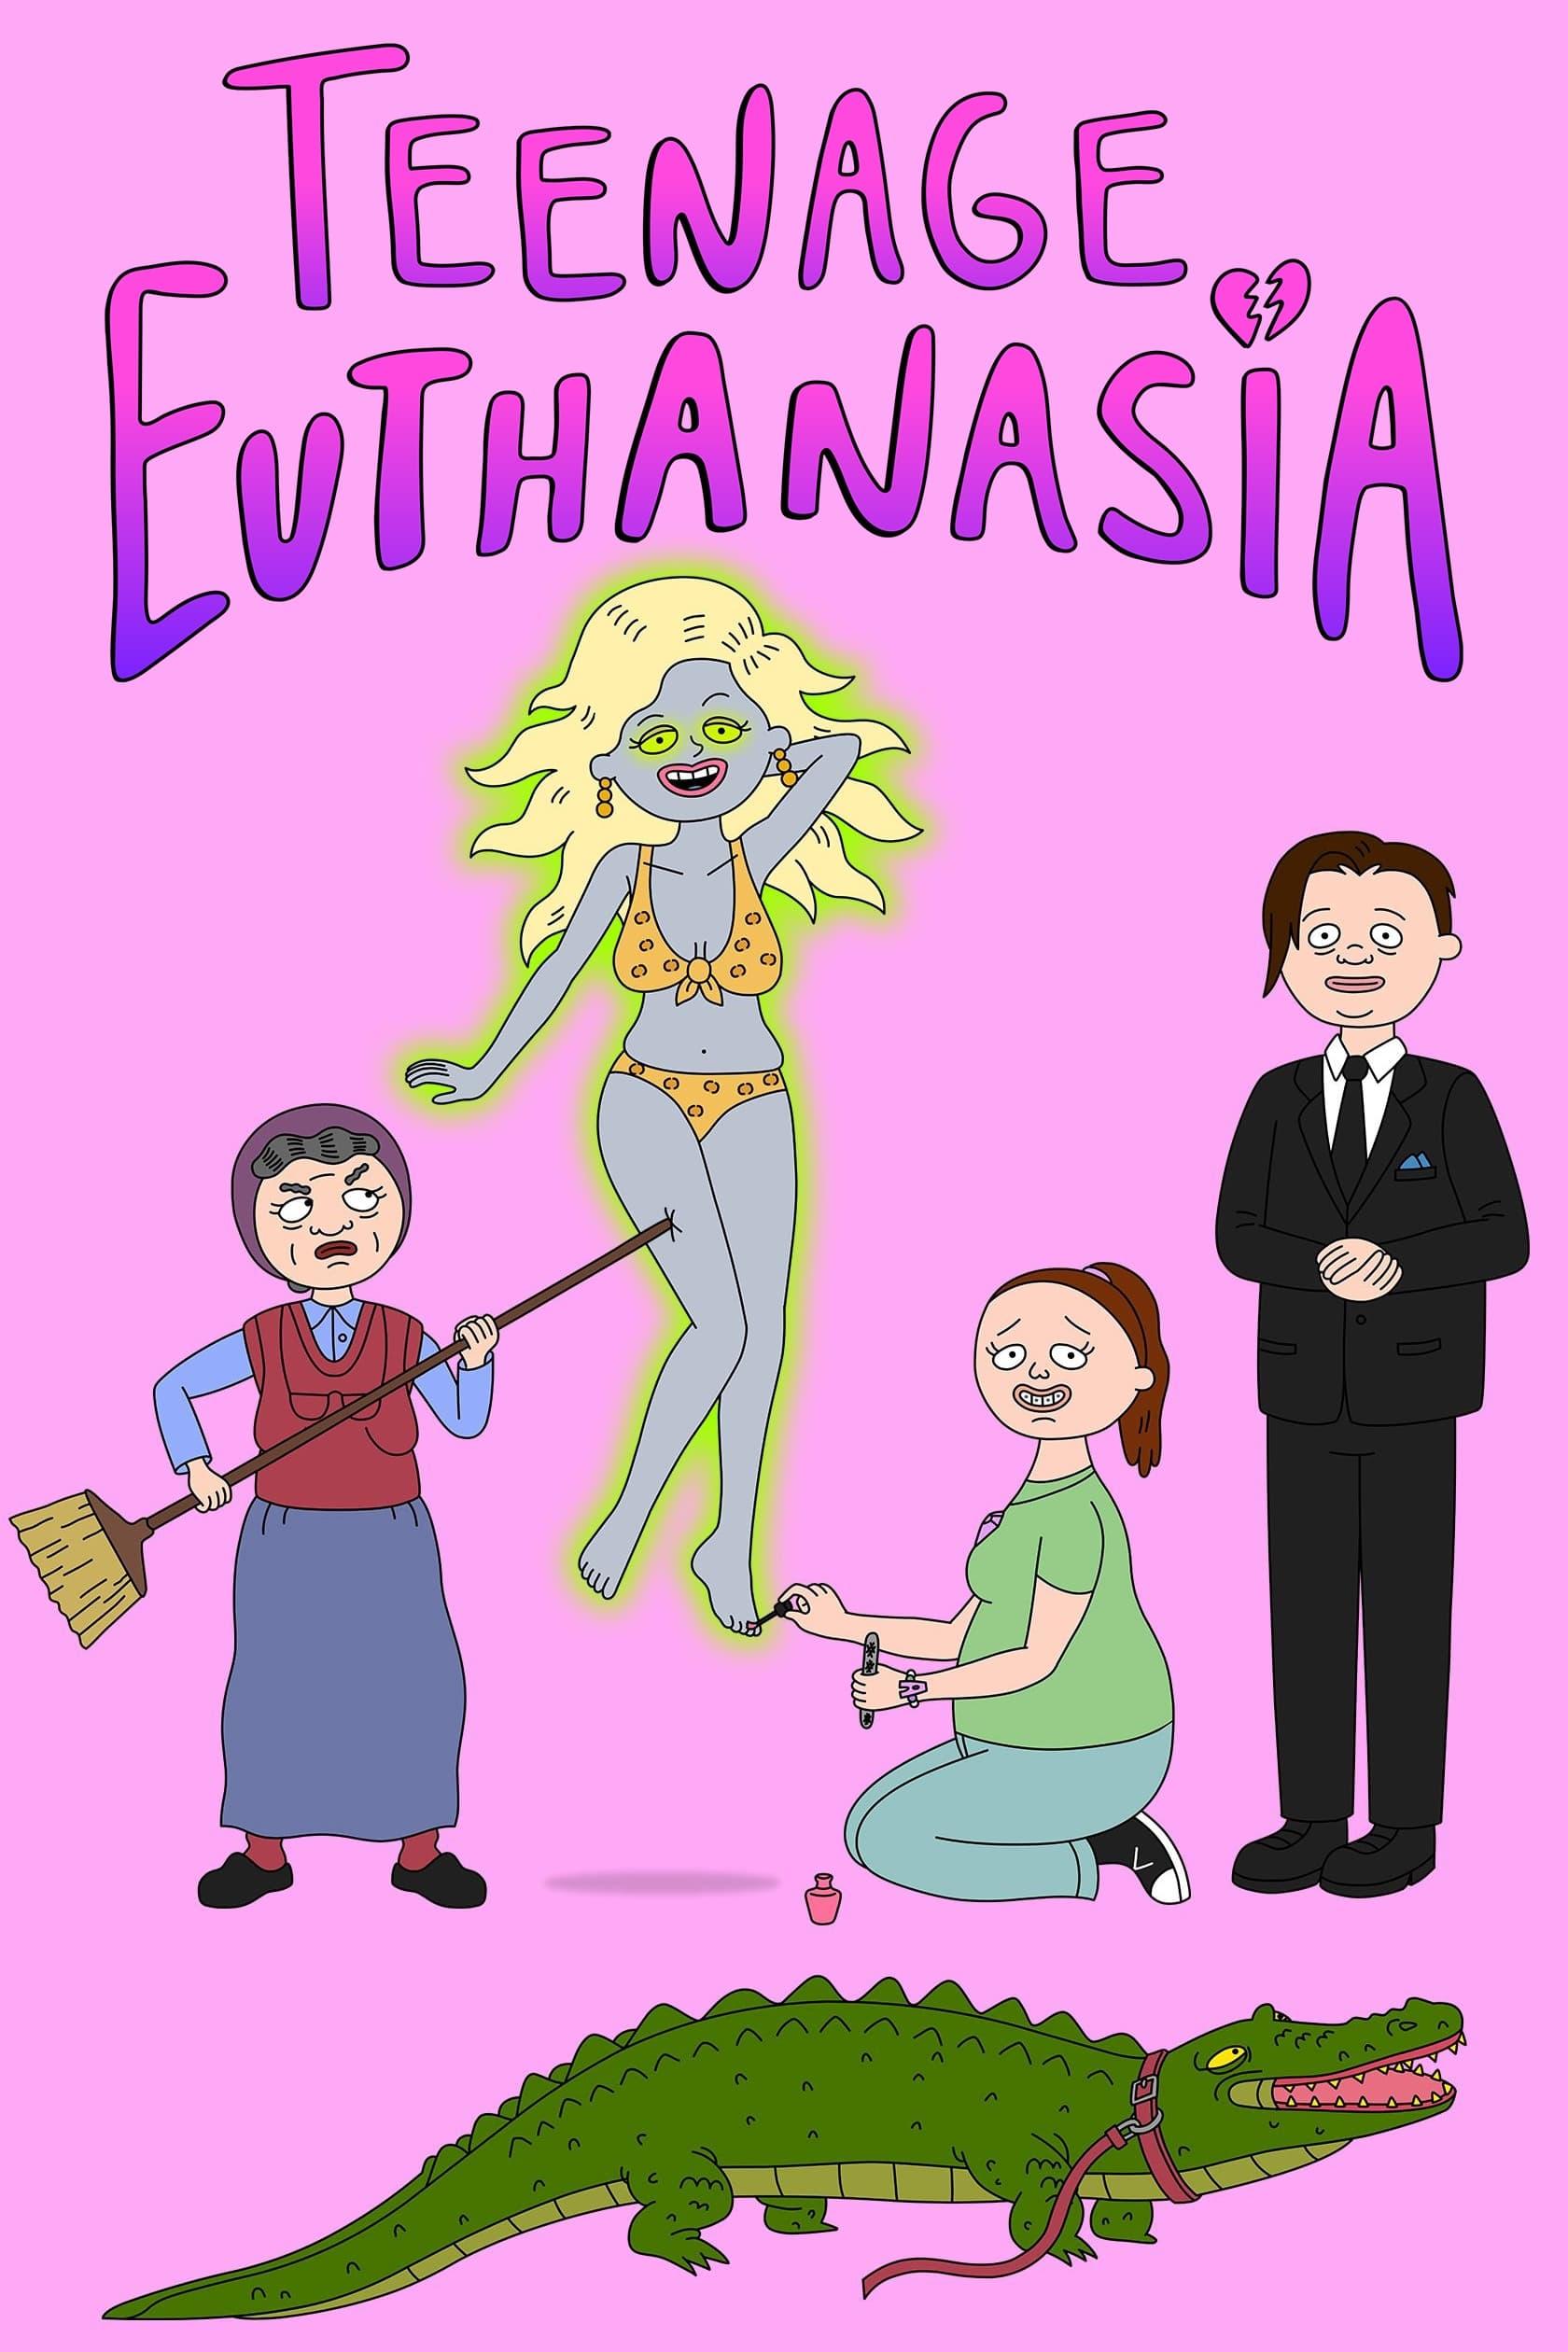 Teenage Euthanasia